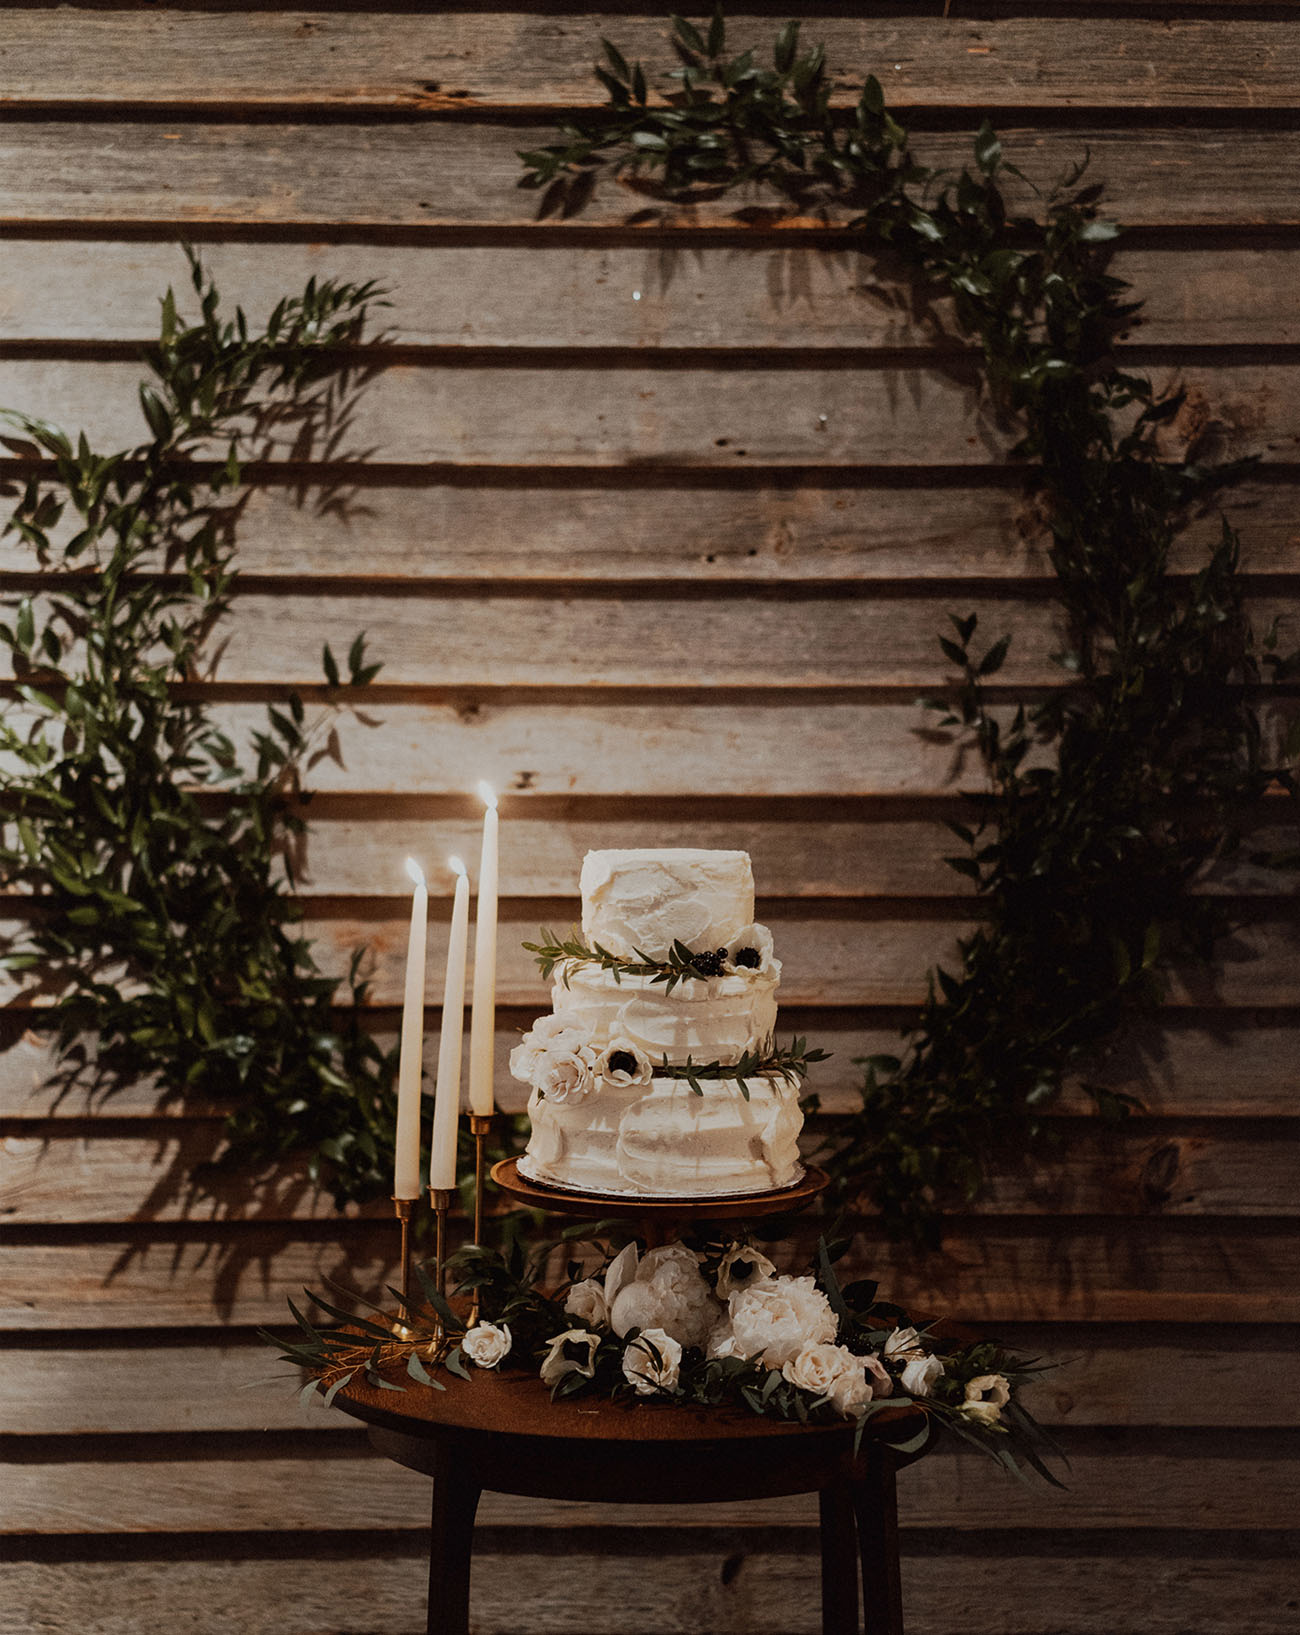 wreath cake backdrop